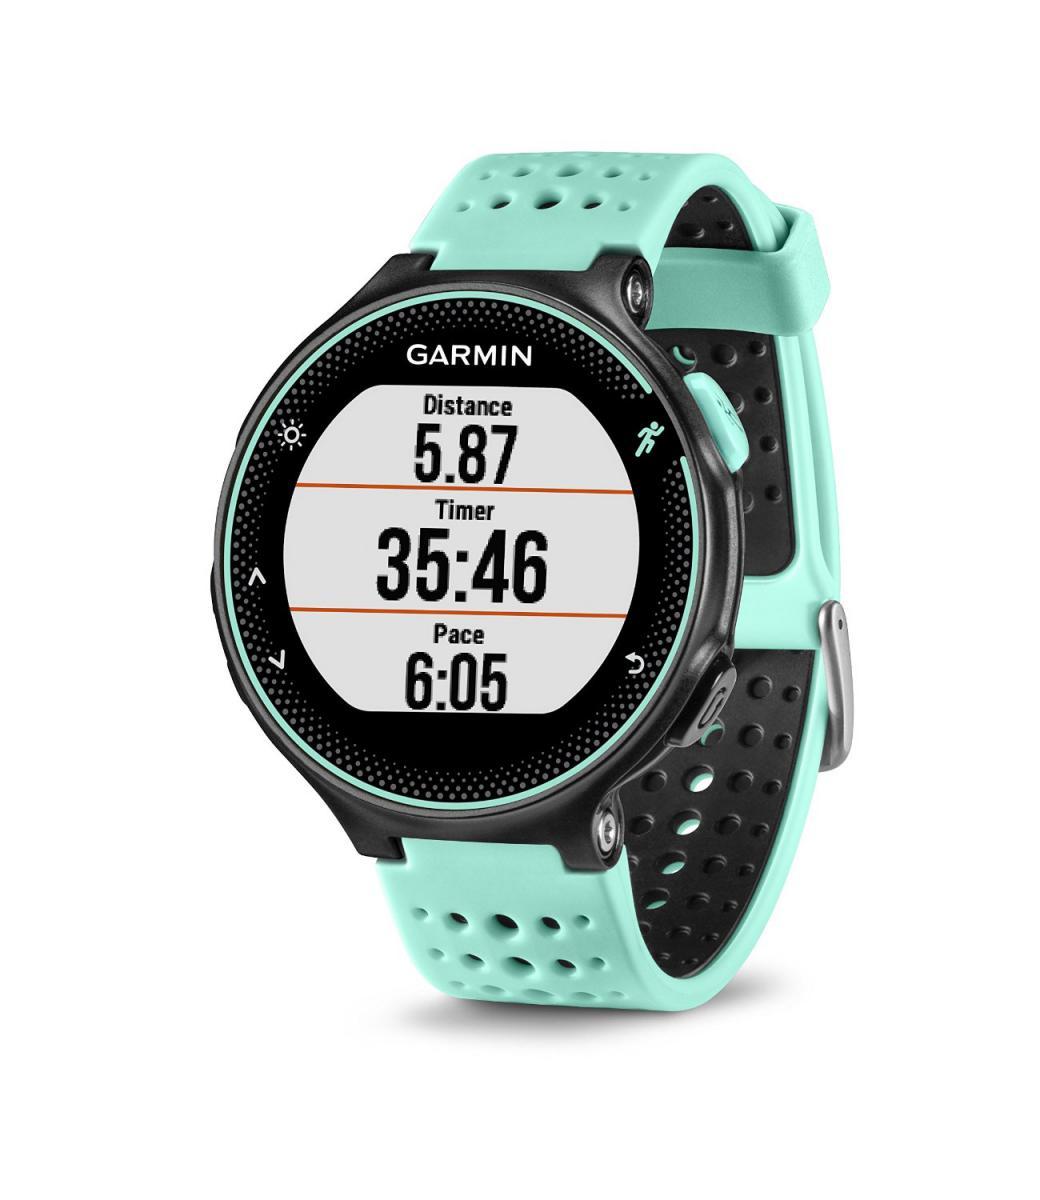 Watch with wrist hrm - Garmin Forerunner 235 Gps Watch Black Blue Smartwatch Hrm Heart Rate Monitor Ebay